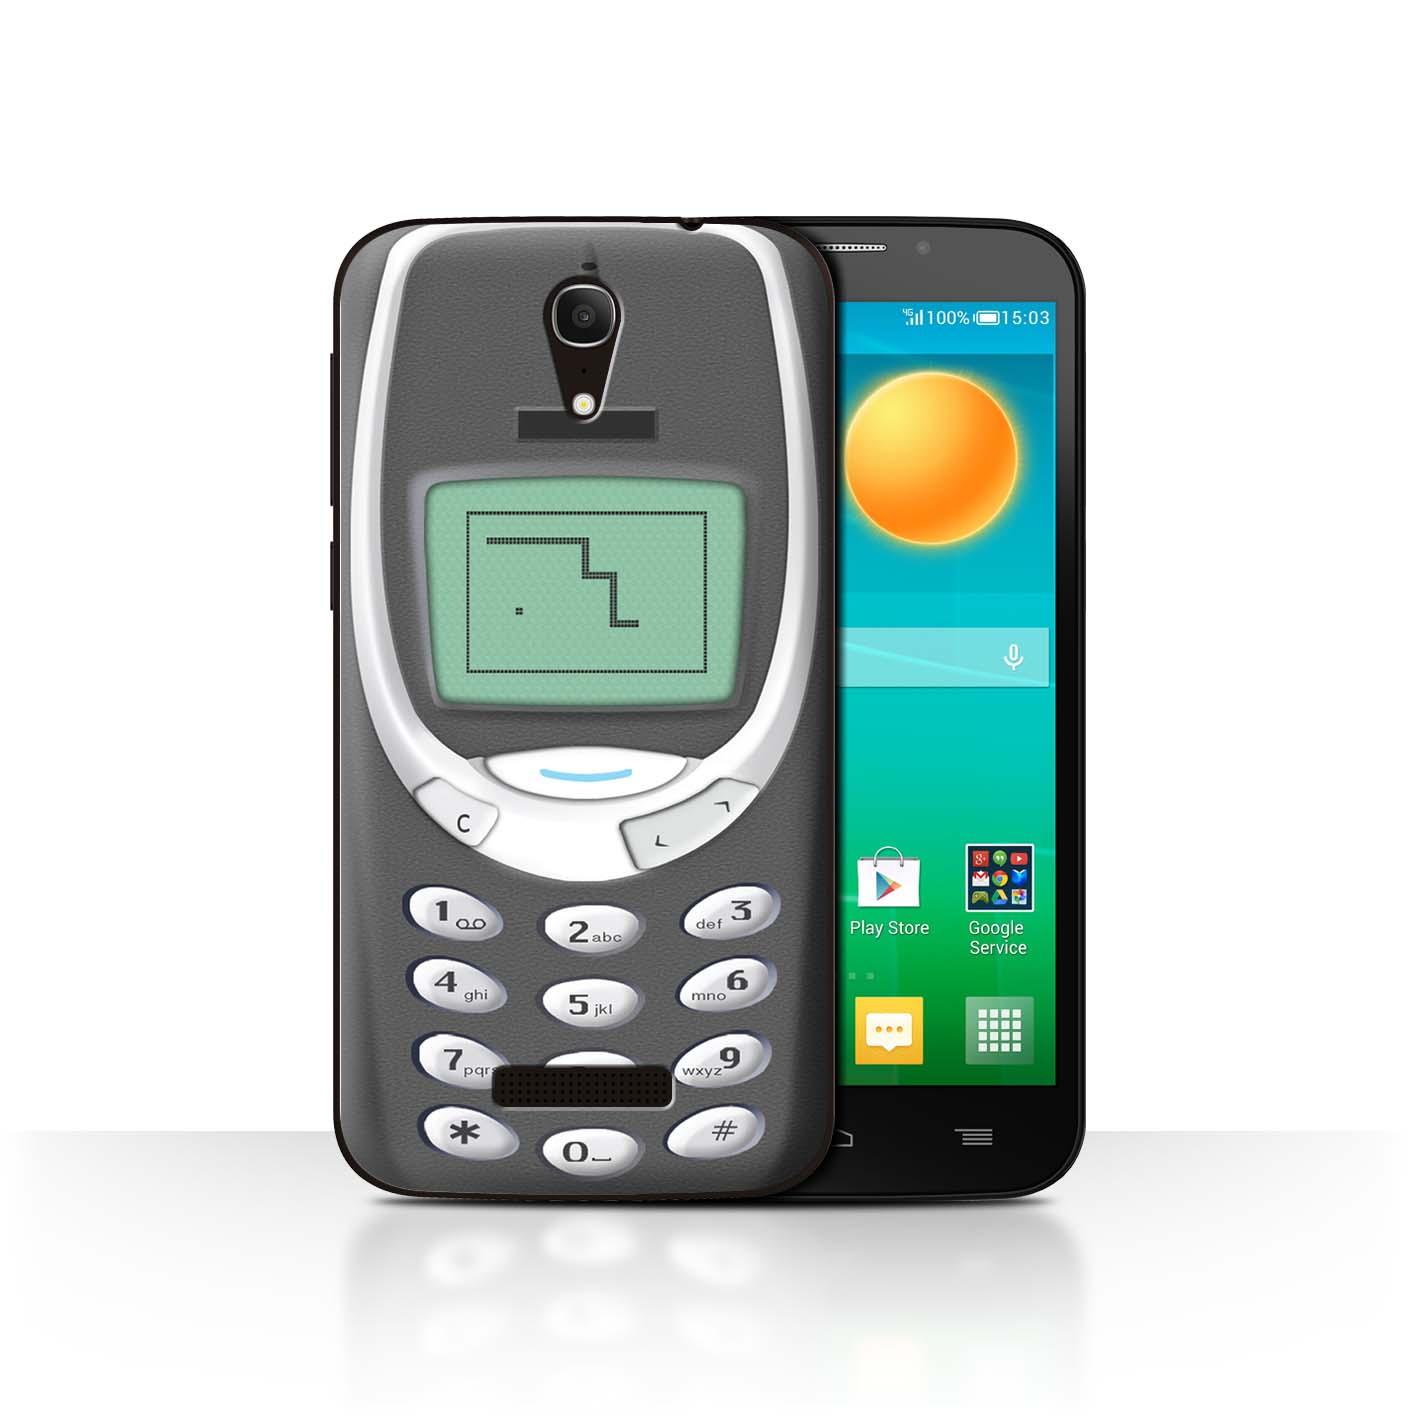 STUFF4-Back-Case-Cover-Skin-for-Alcatel-Pop-S7-Retro-Phones